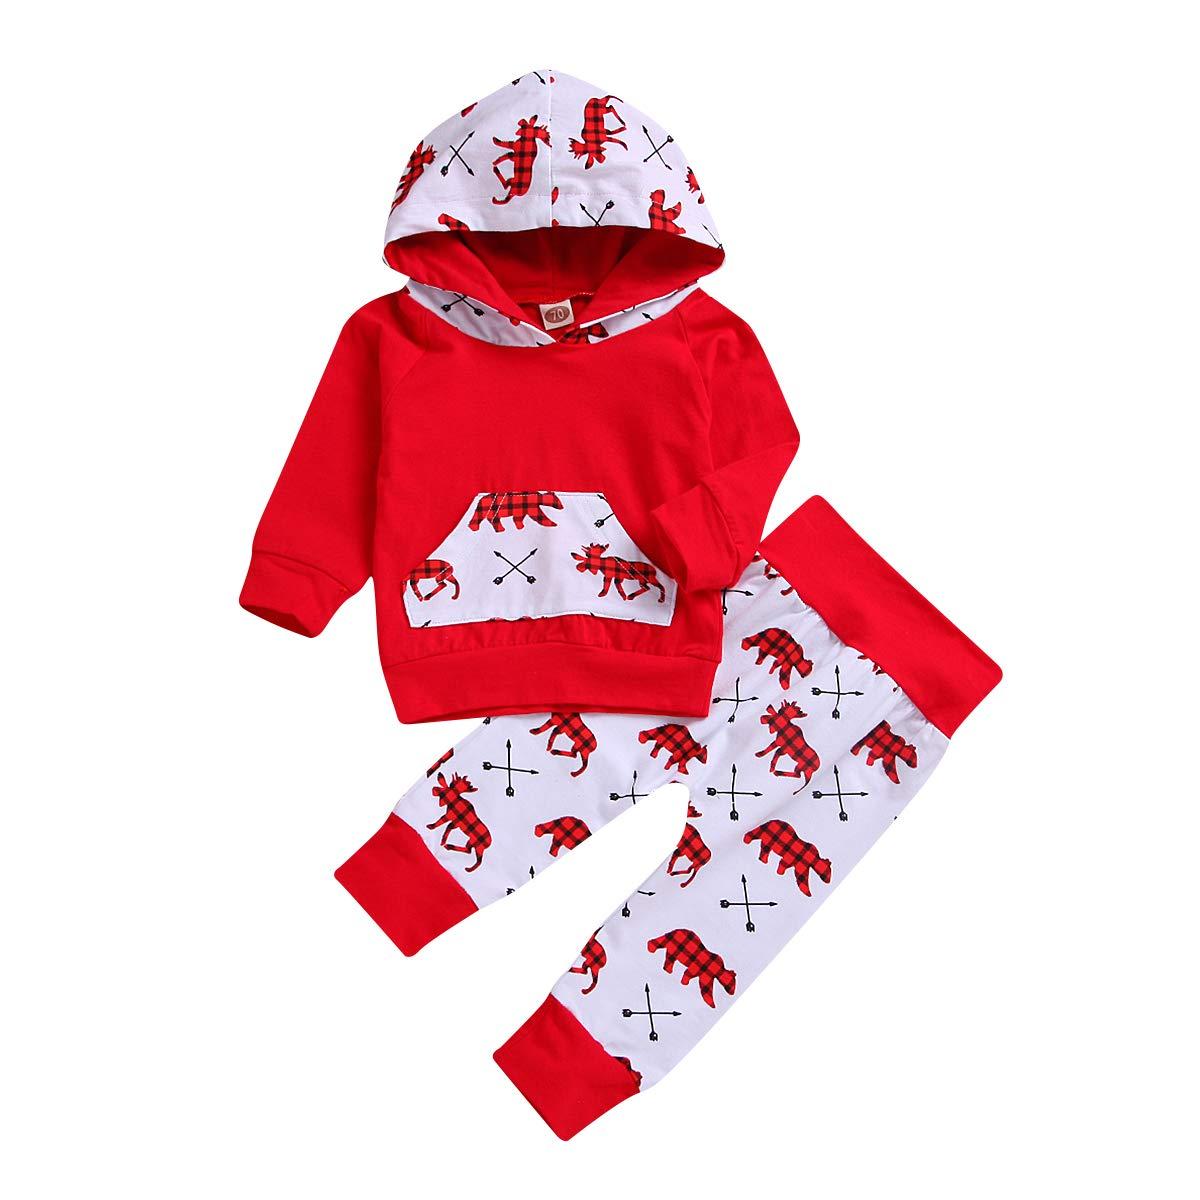 HappyMA PANTS ユニセックスベビー 0 - 6 Months Red & Hoddie B07KVXZLWF